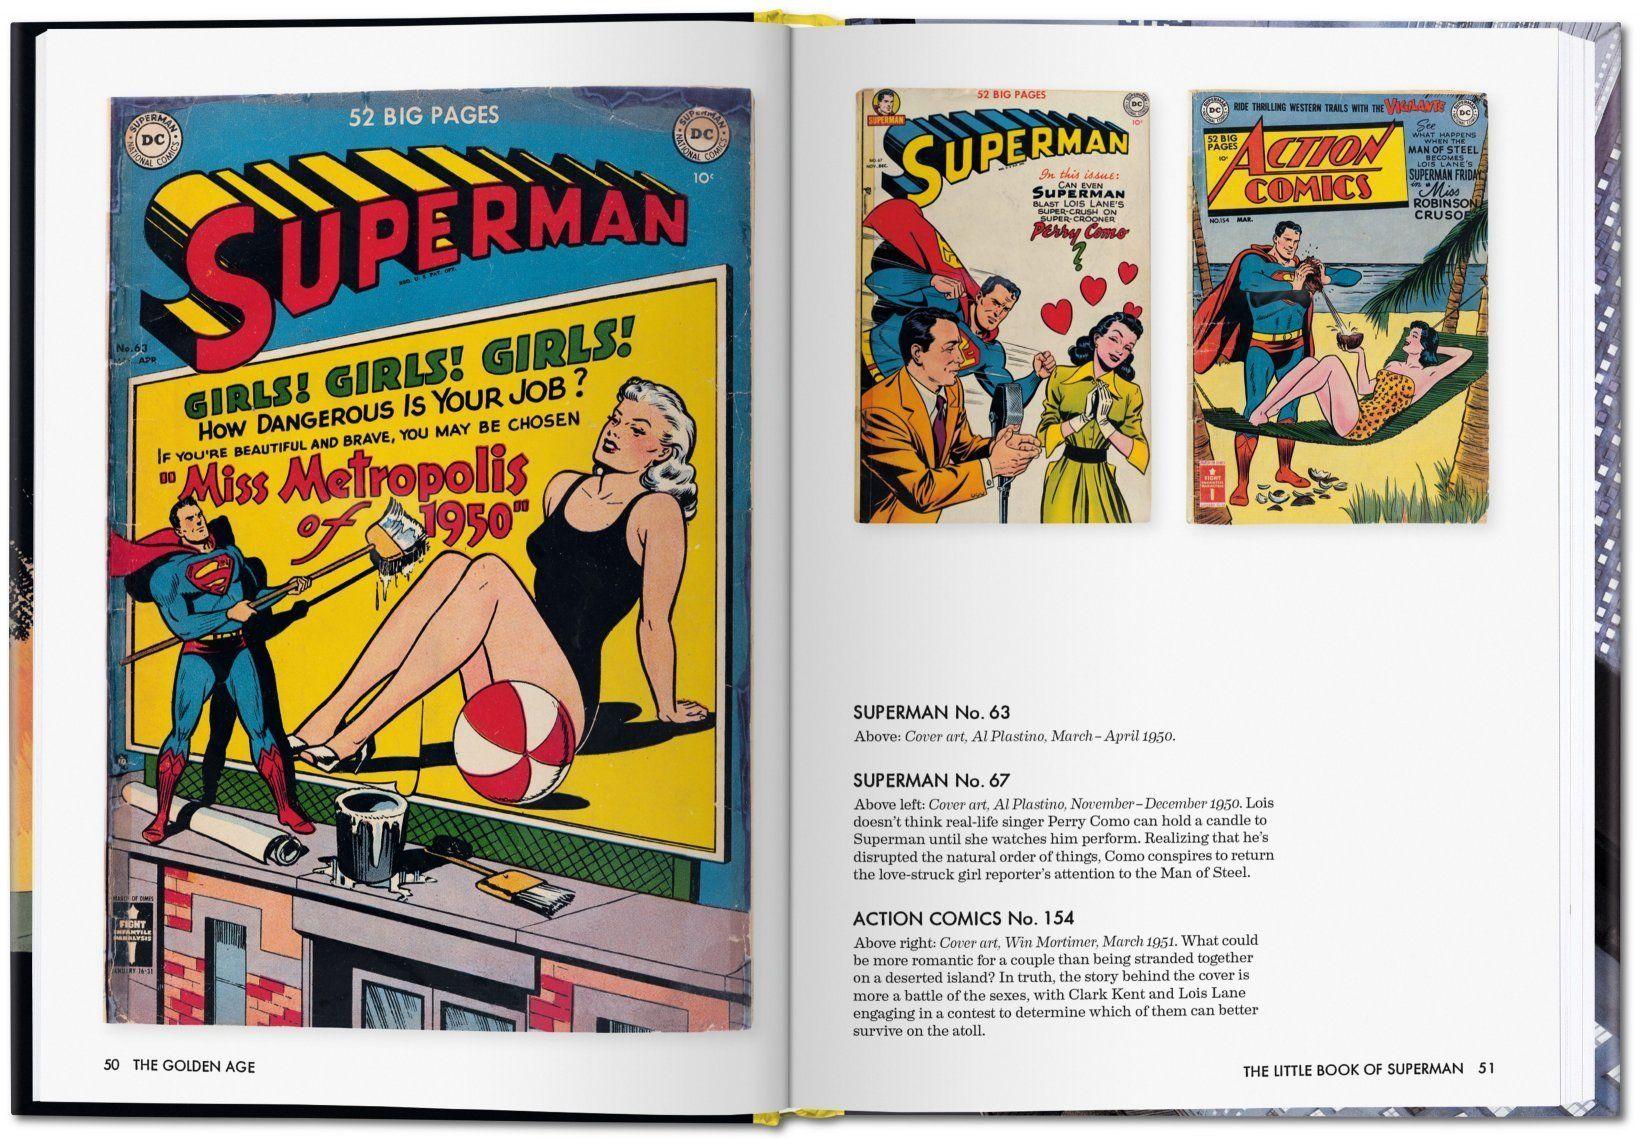 The Little Book Of Superman Ediz Italiana Spagnola E Portoghese Sponsored Ediz Superman Book Portoghese Nel 2020 Superman Portoghese The Avengers